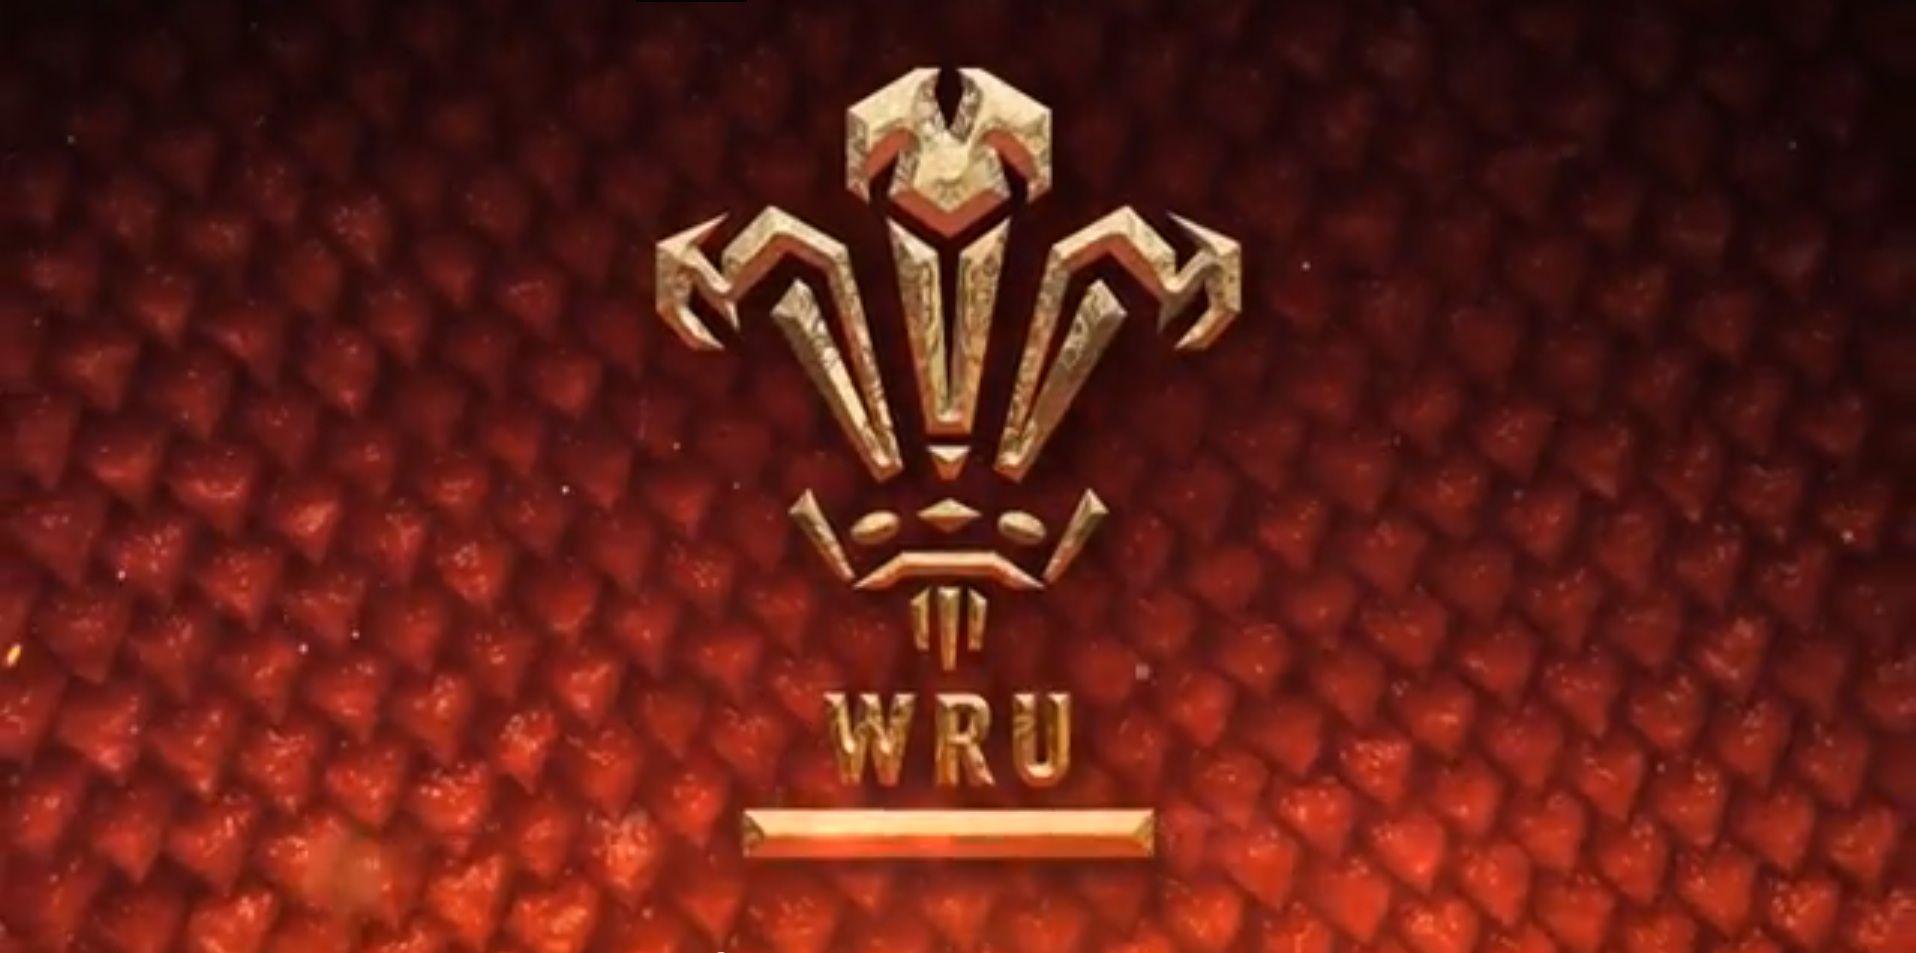 WRU logo on dragon scale background Logos, Art logo